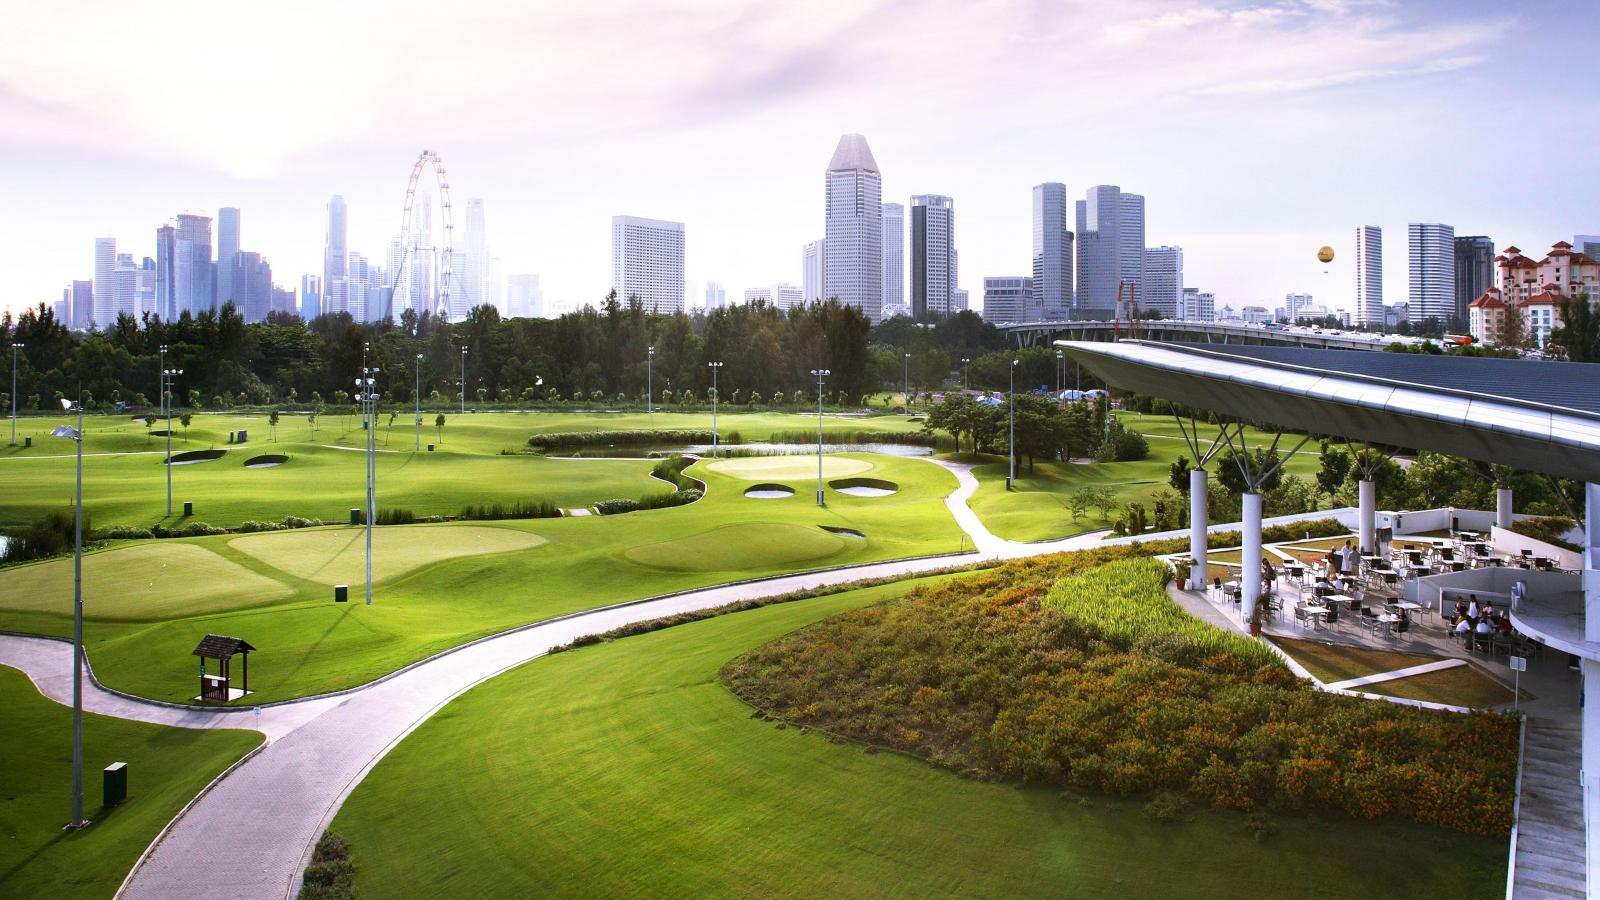 https://bubo.sk/uploads/galleries/5060/marina-bay-golf-course-10-xl.jpg